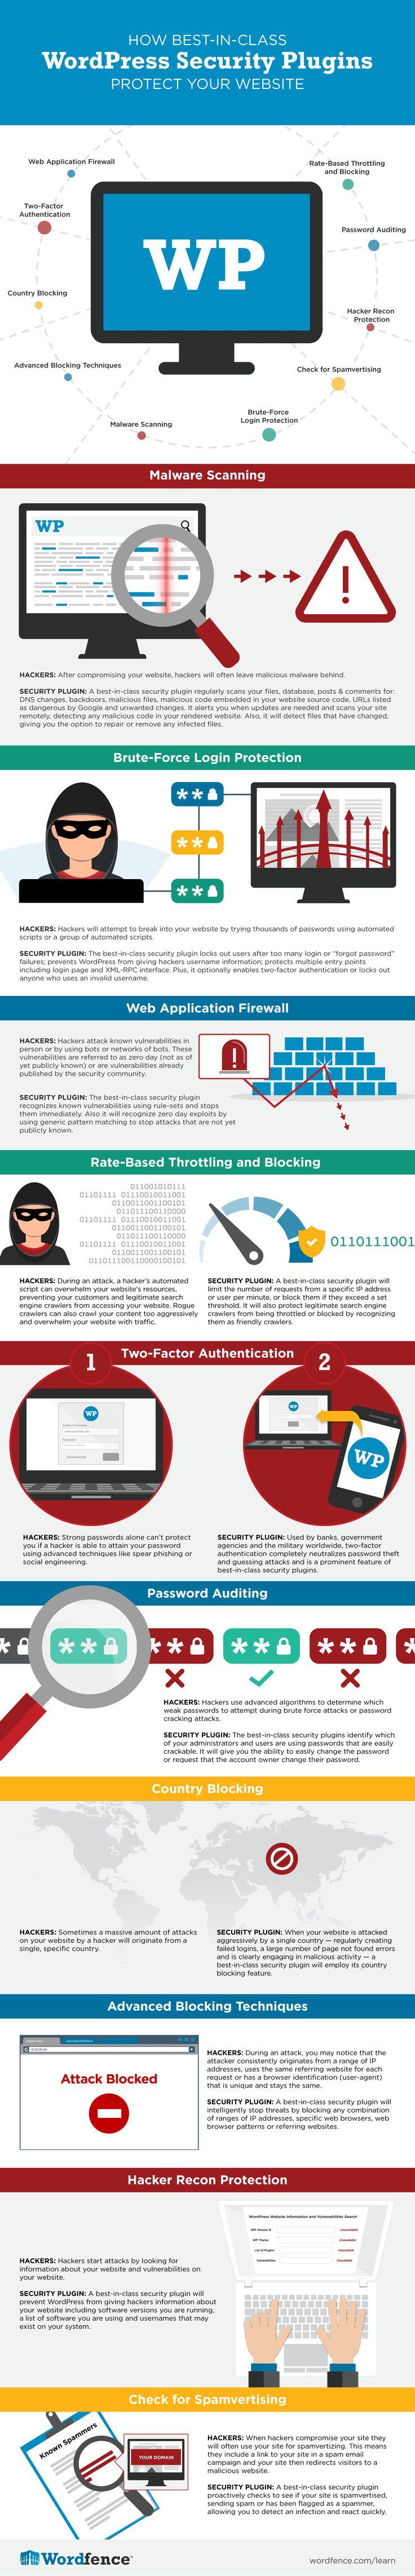 How WordPress Security Plugins Work